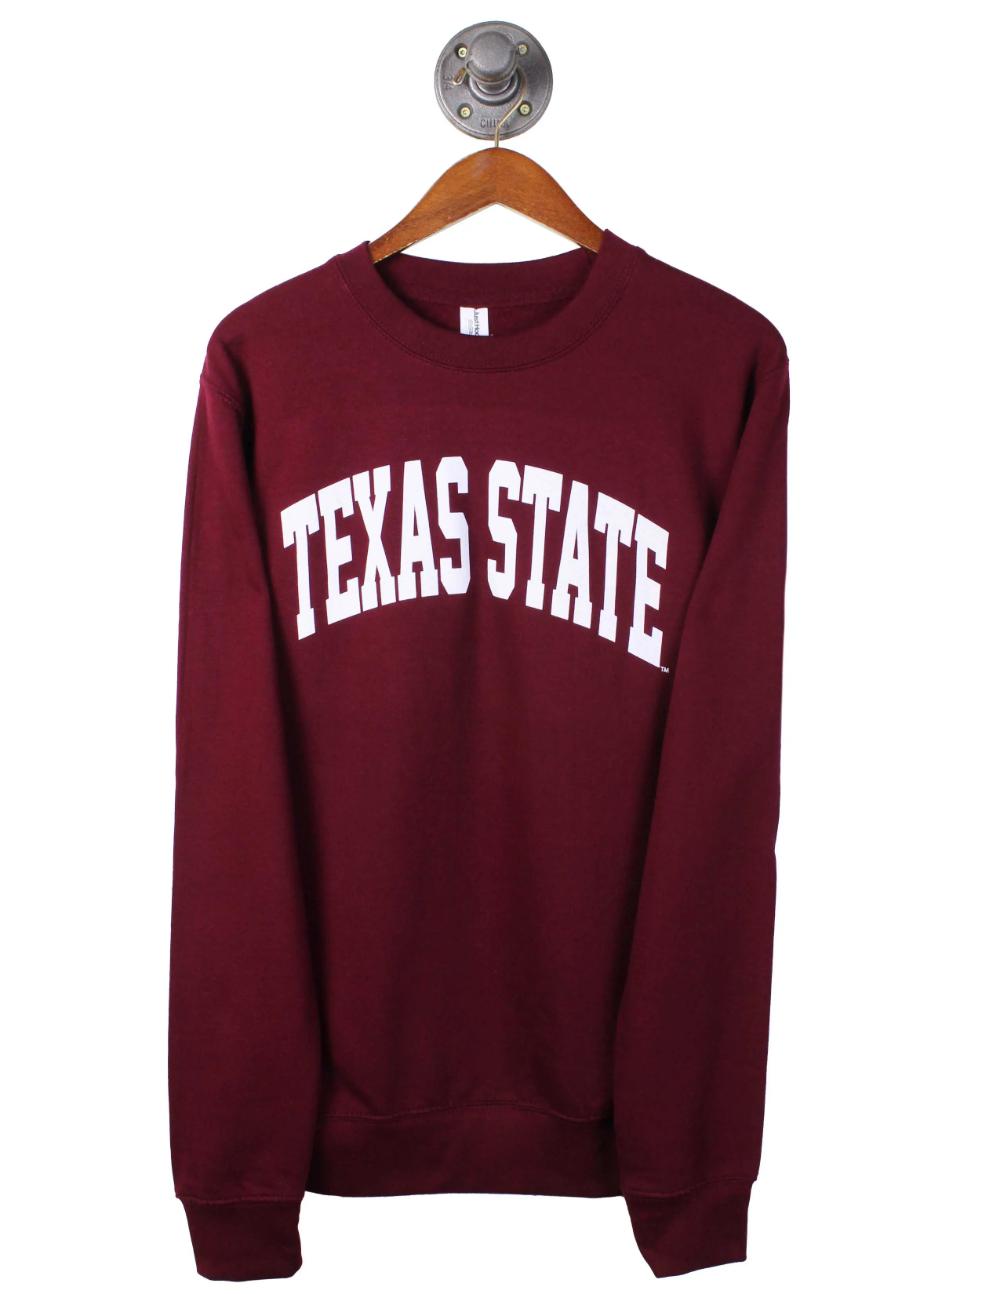 Txst Prestige Crewneck Barefoot Campus Outfitter In 2021 State Sweatshirt The Prestige Crew Neck [ 1294 x 1000 Pixel ]